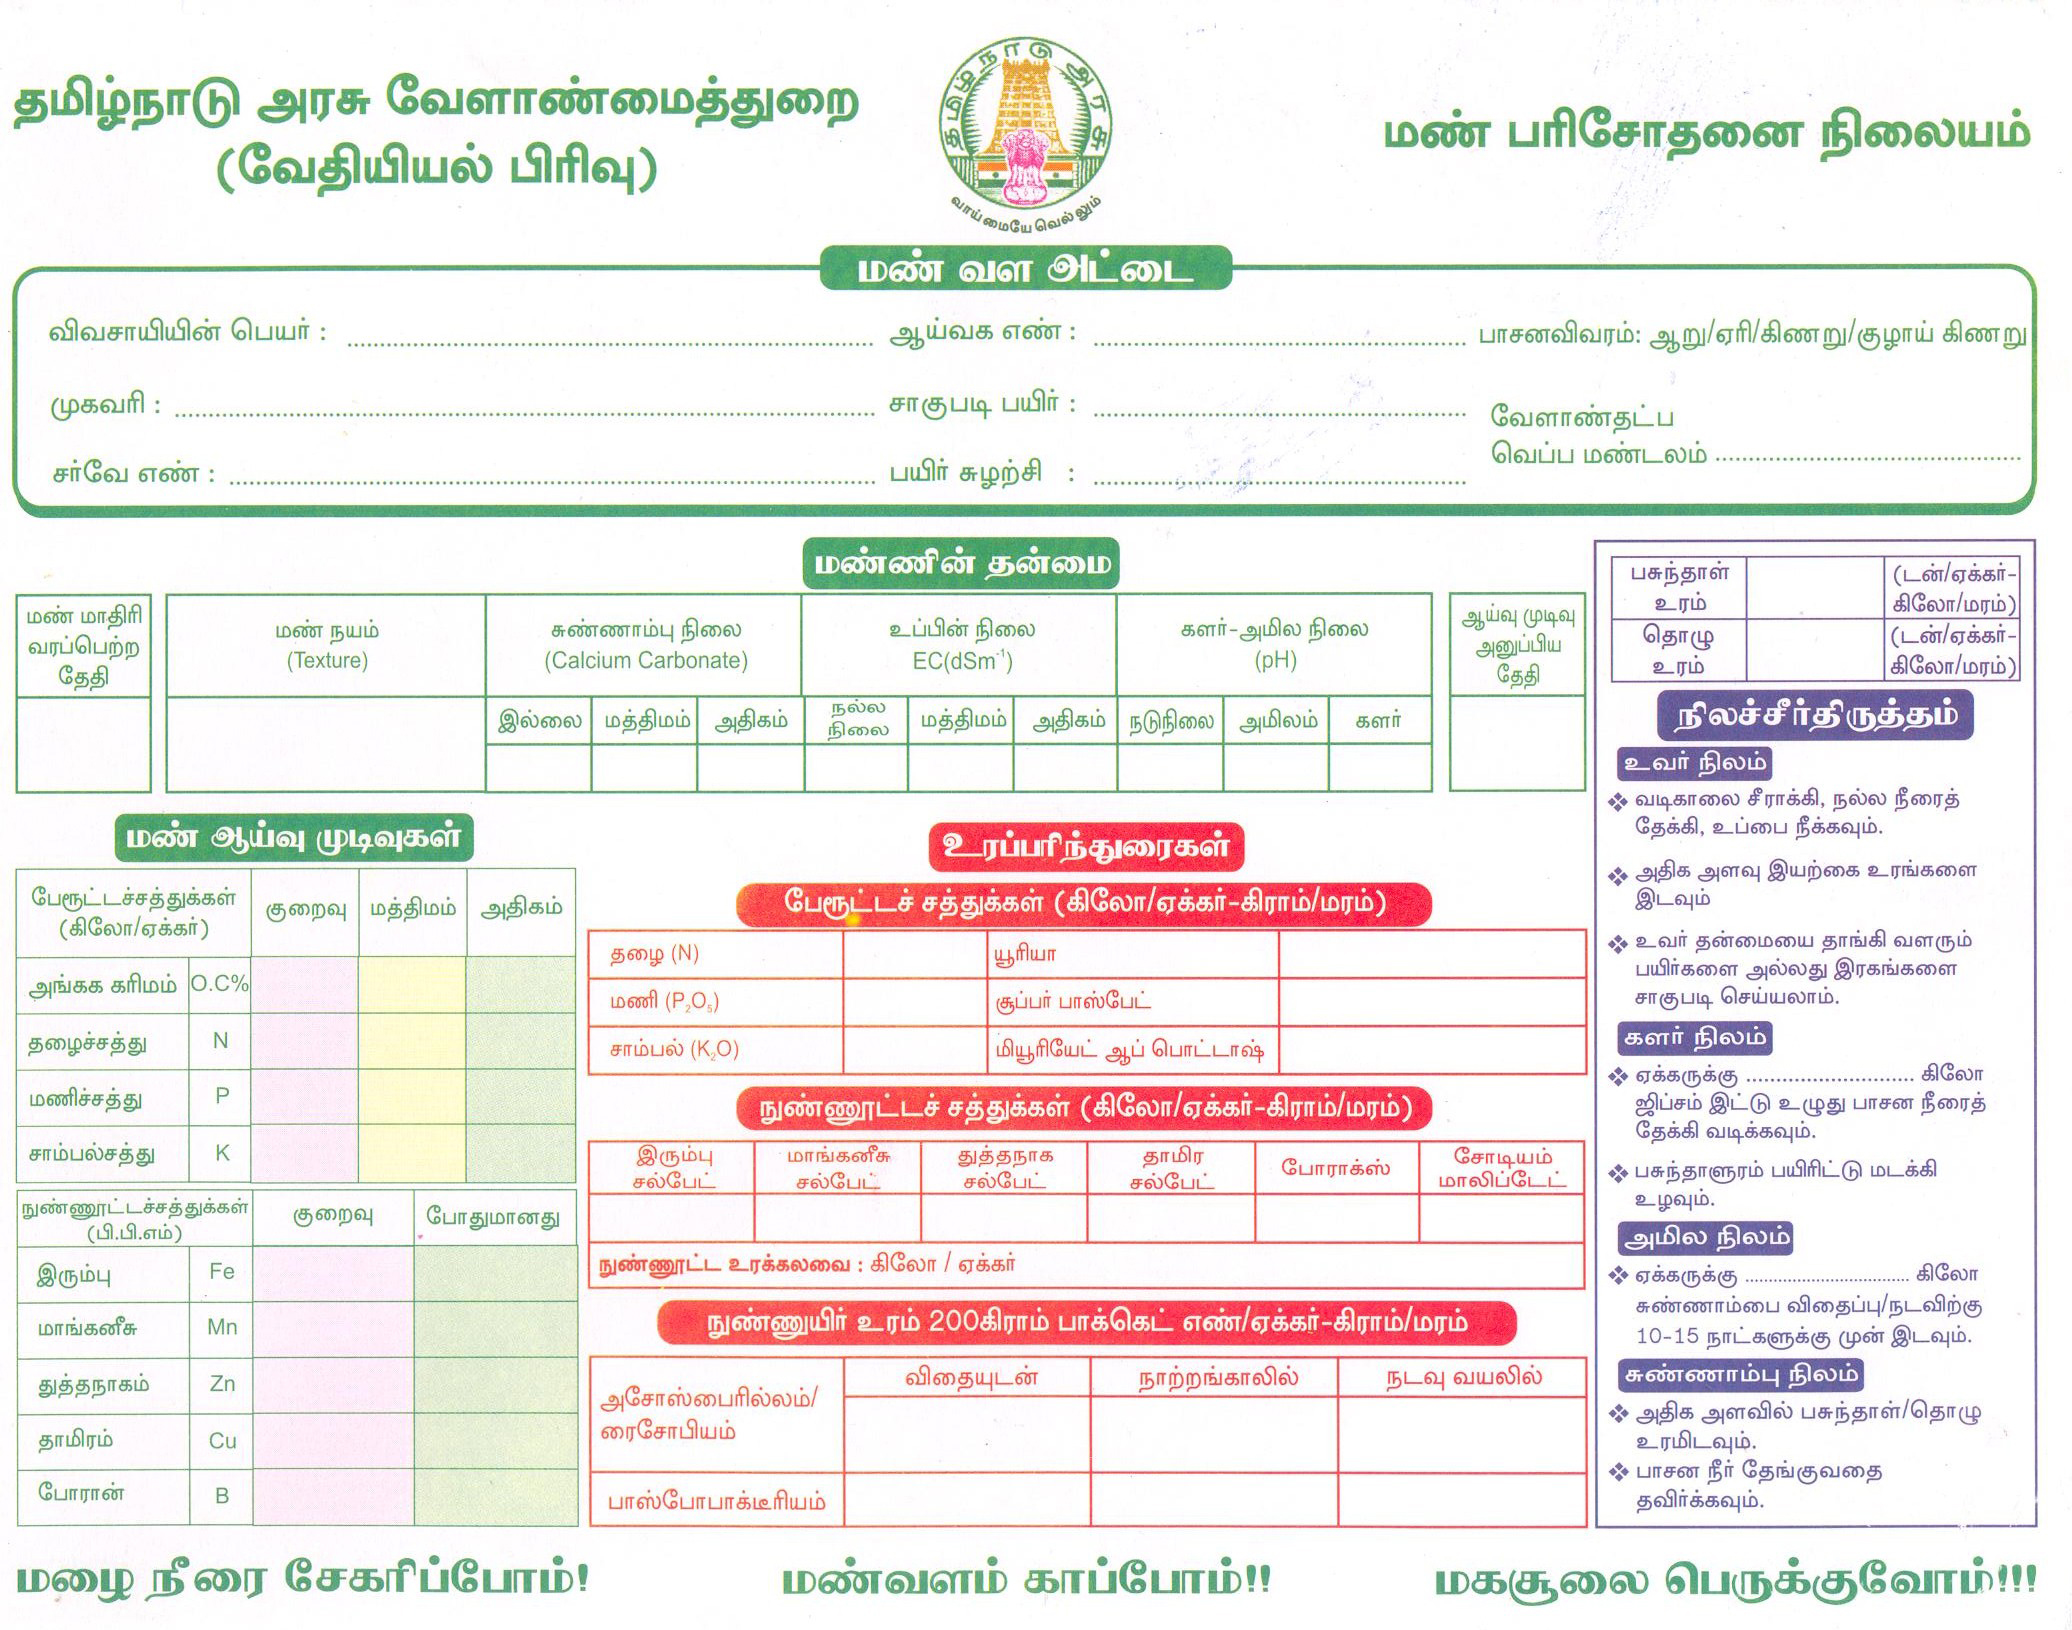 WikiZero - Tamil Nadu State Agricultural Marketing Board